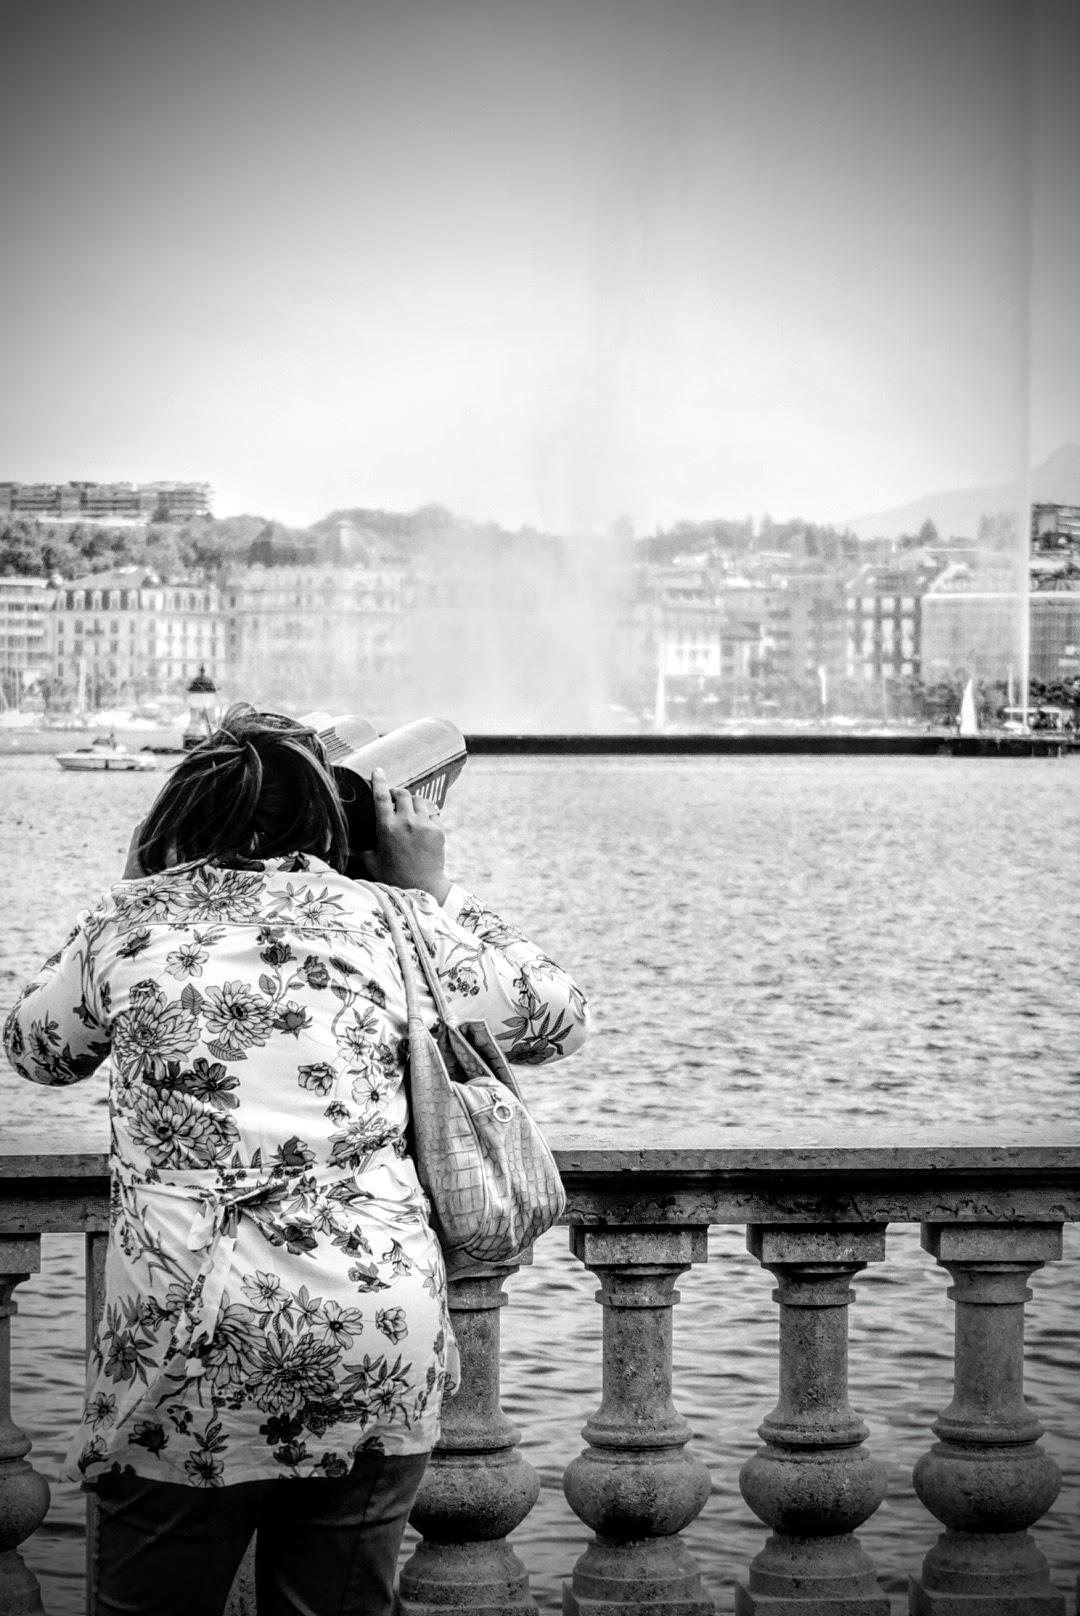 Geneva, Switzerland (2015)